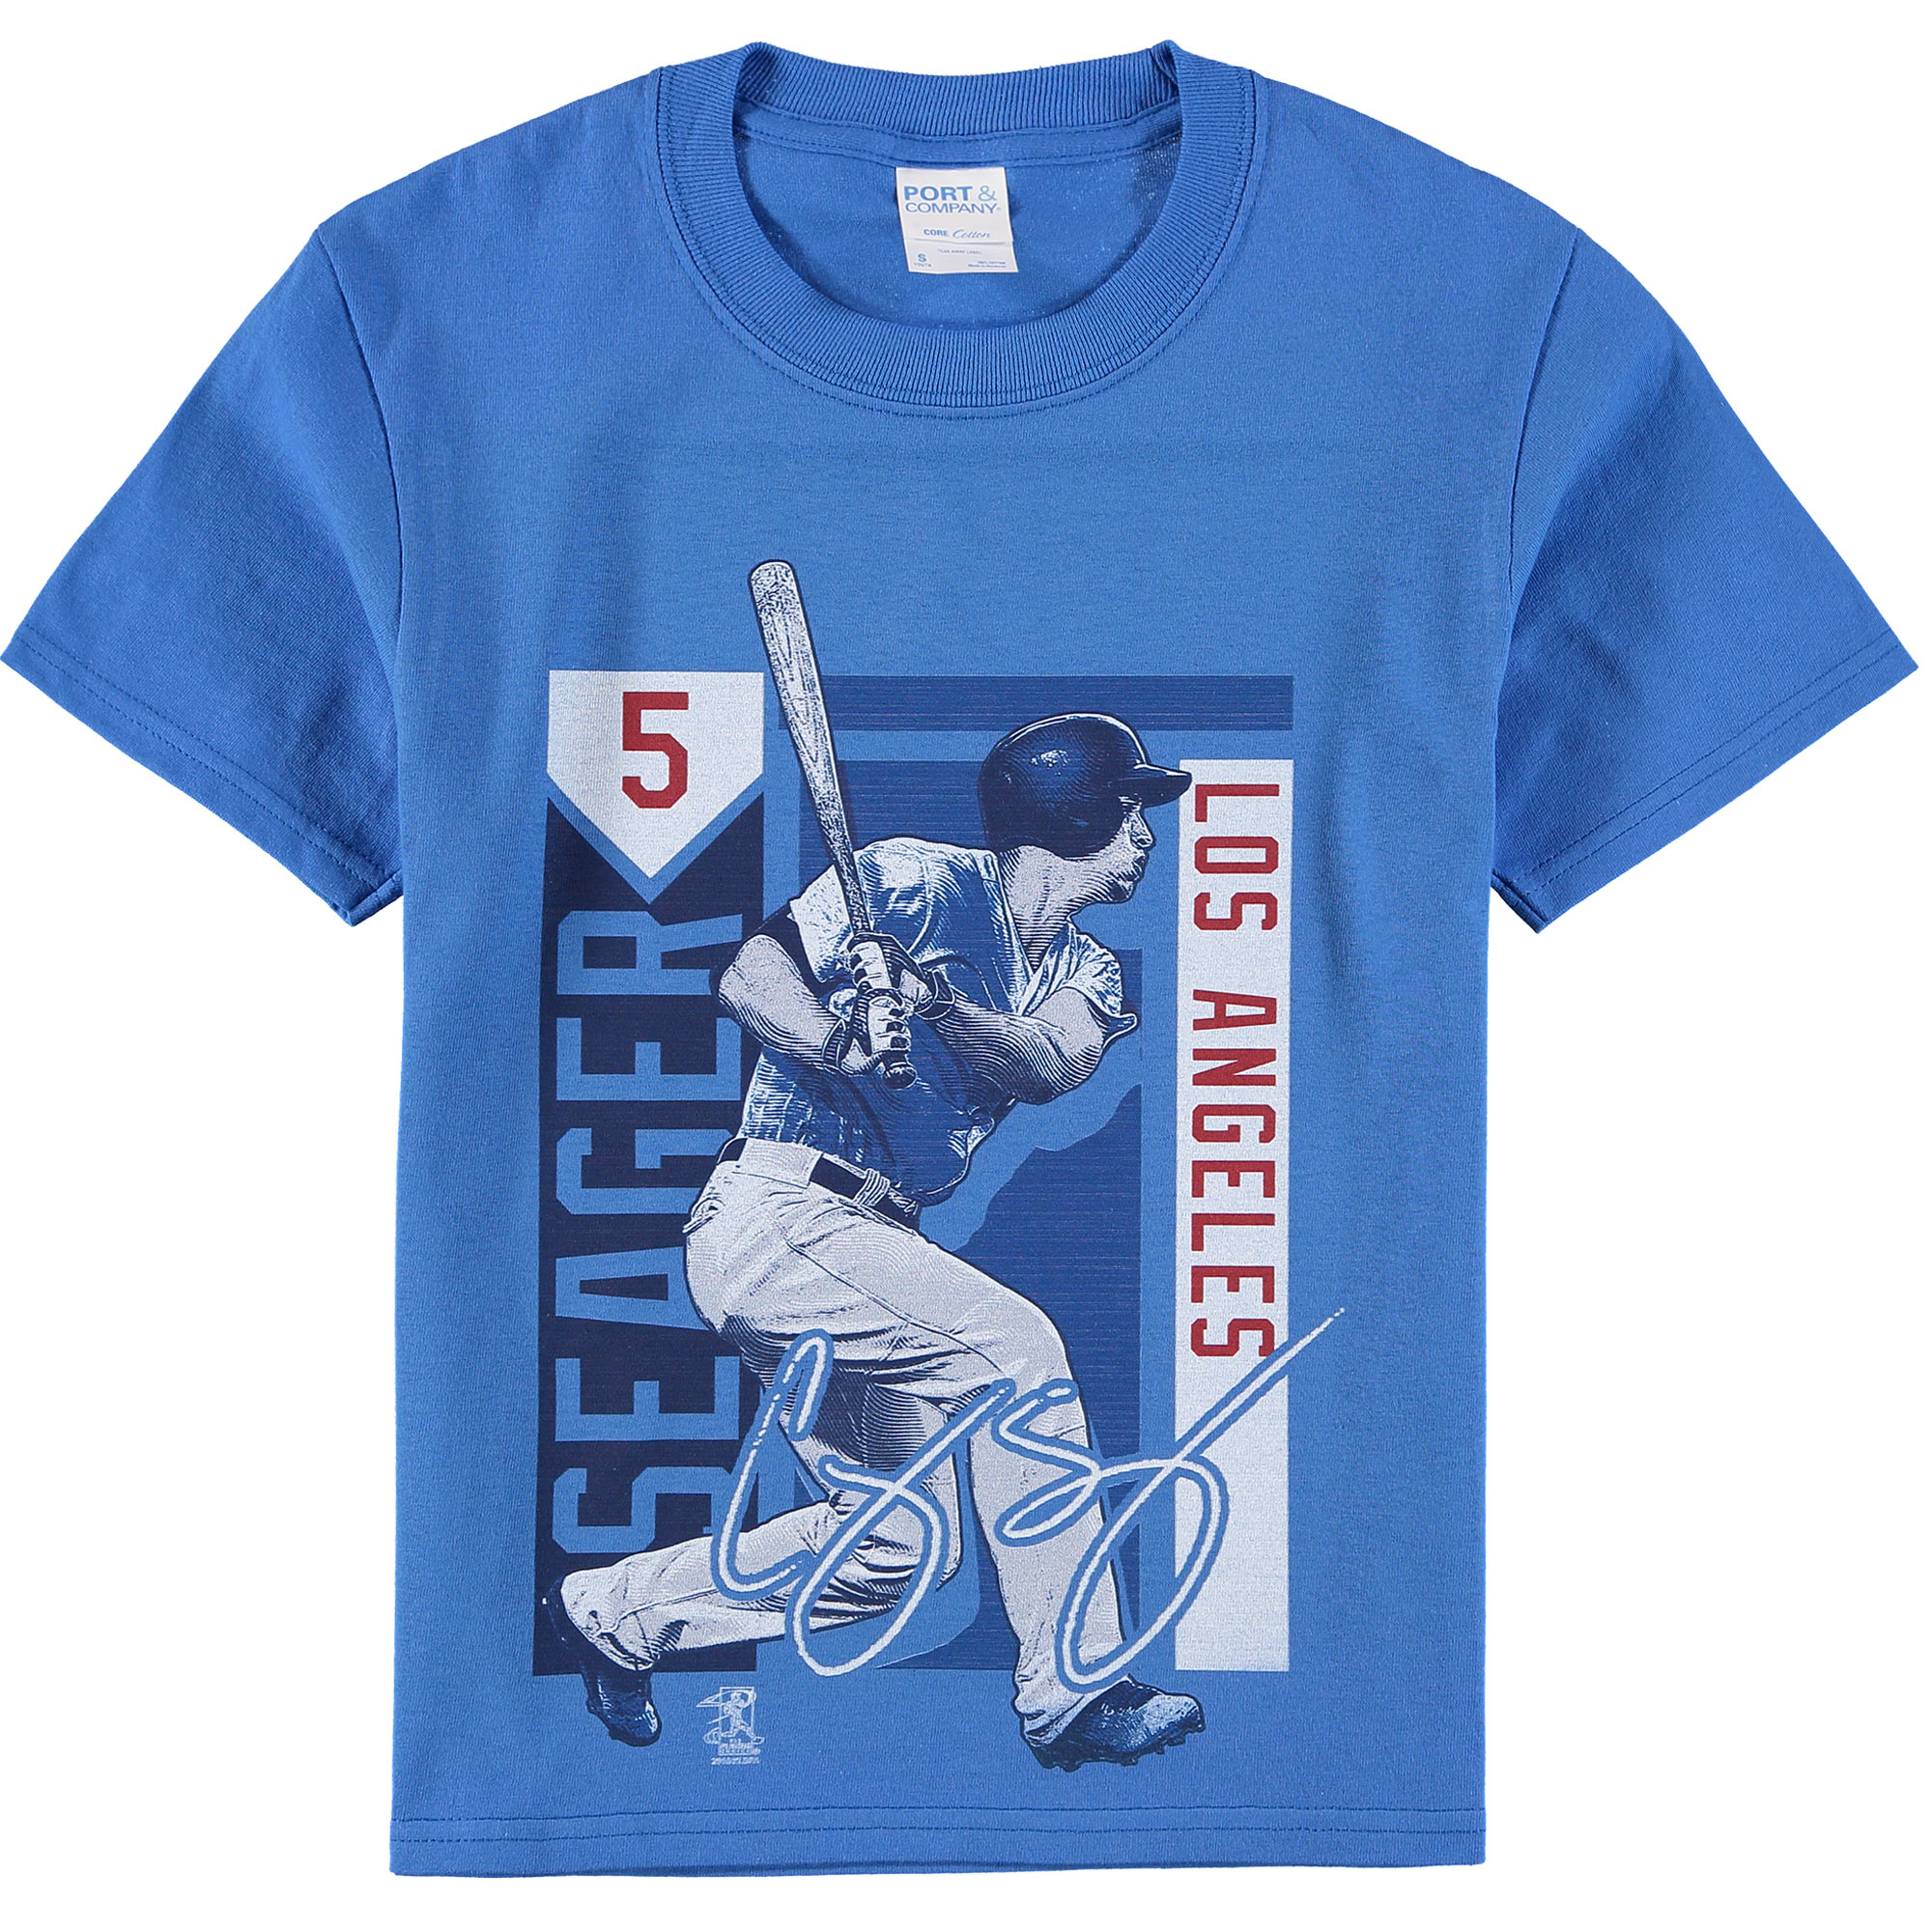 best website e4c5e de280 Corey Seager Los Angeles Dodgers Youth Color Block Player Series Graphic  T-Shirt - Royal